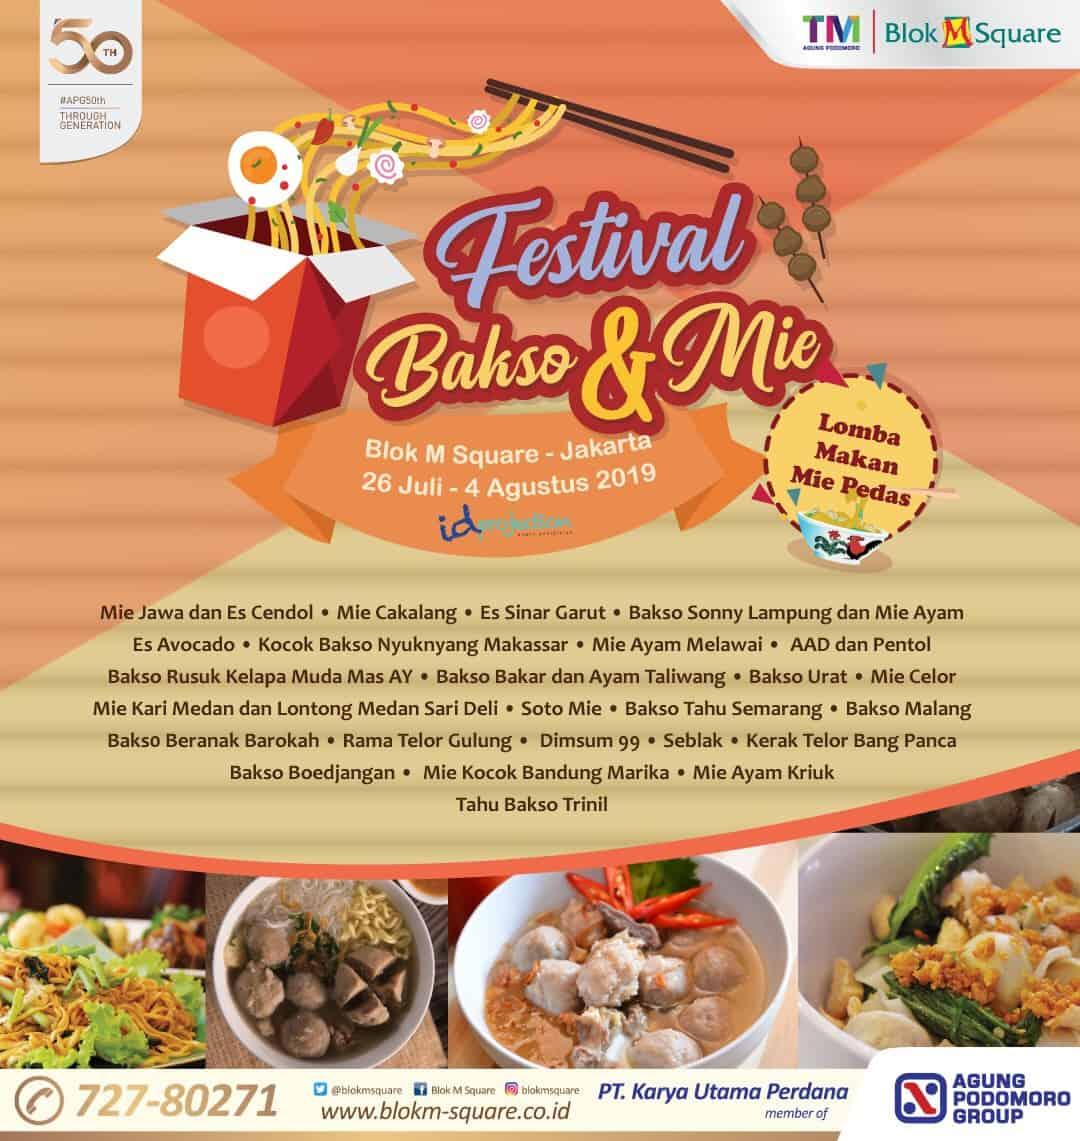 Festival Bakso & Mie Blok M Square